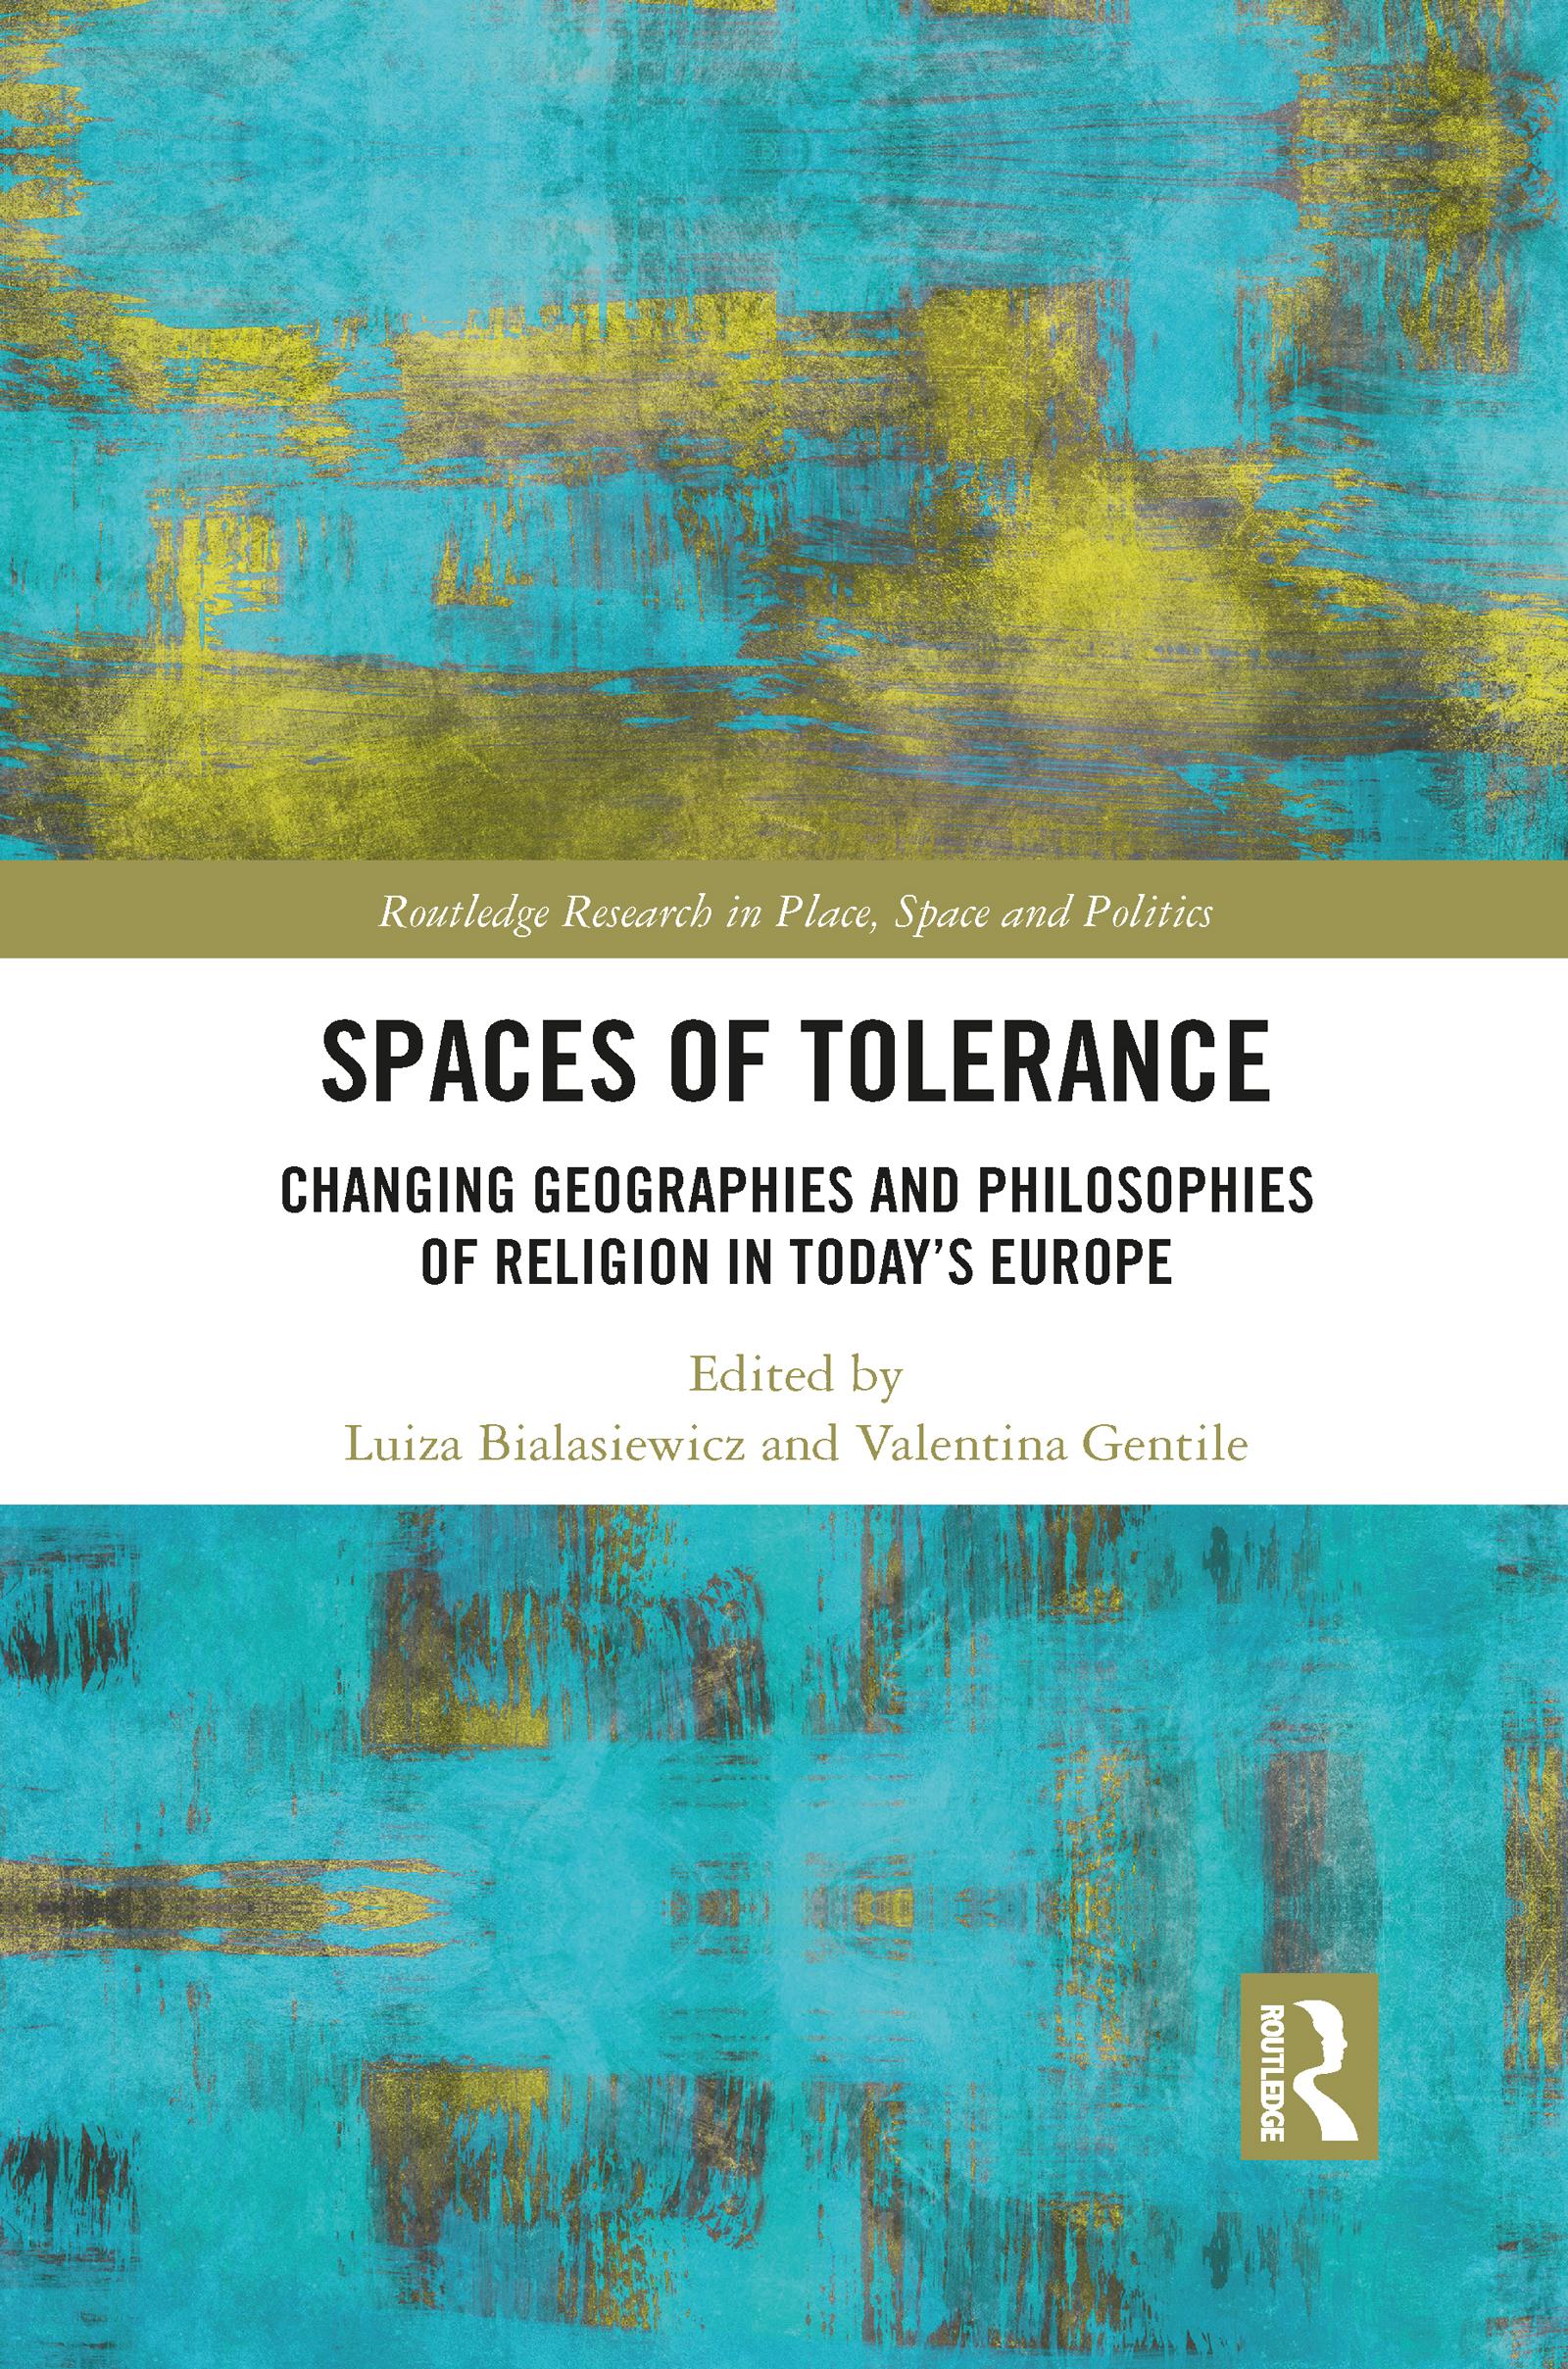 Spaces of Tolerance